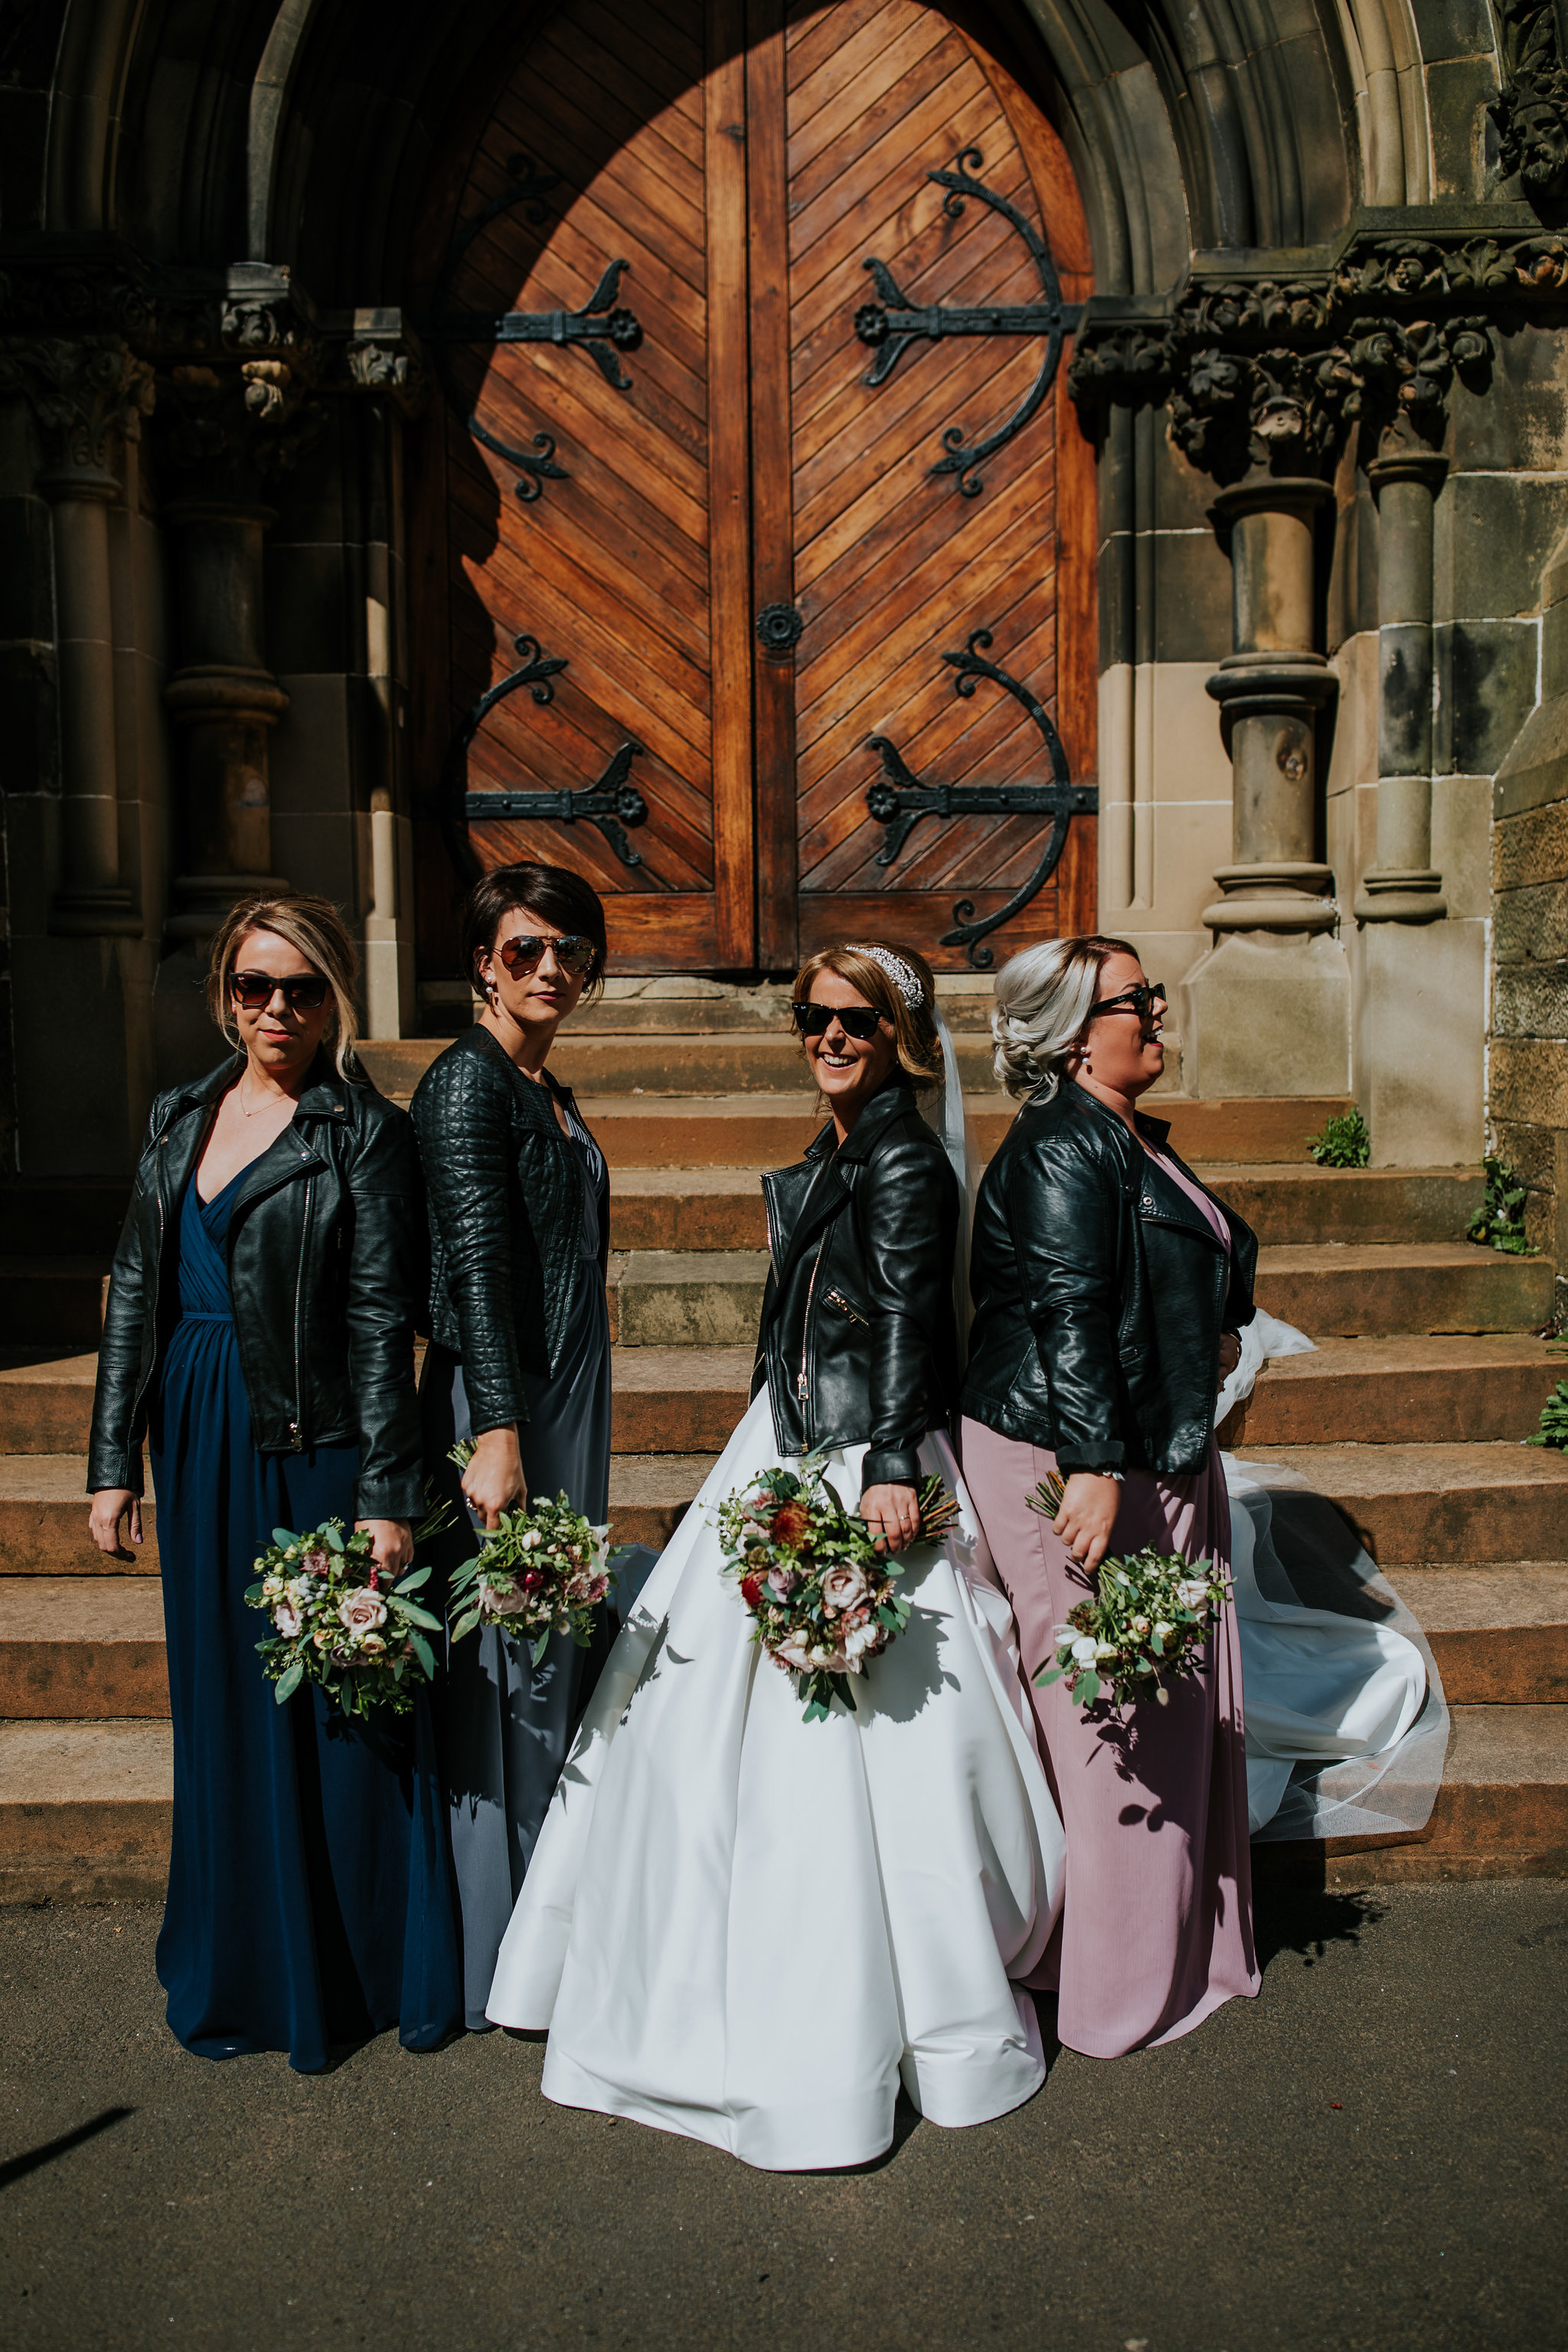 Cottiers wedding lavender and rose wedding florists scotland14.jpg